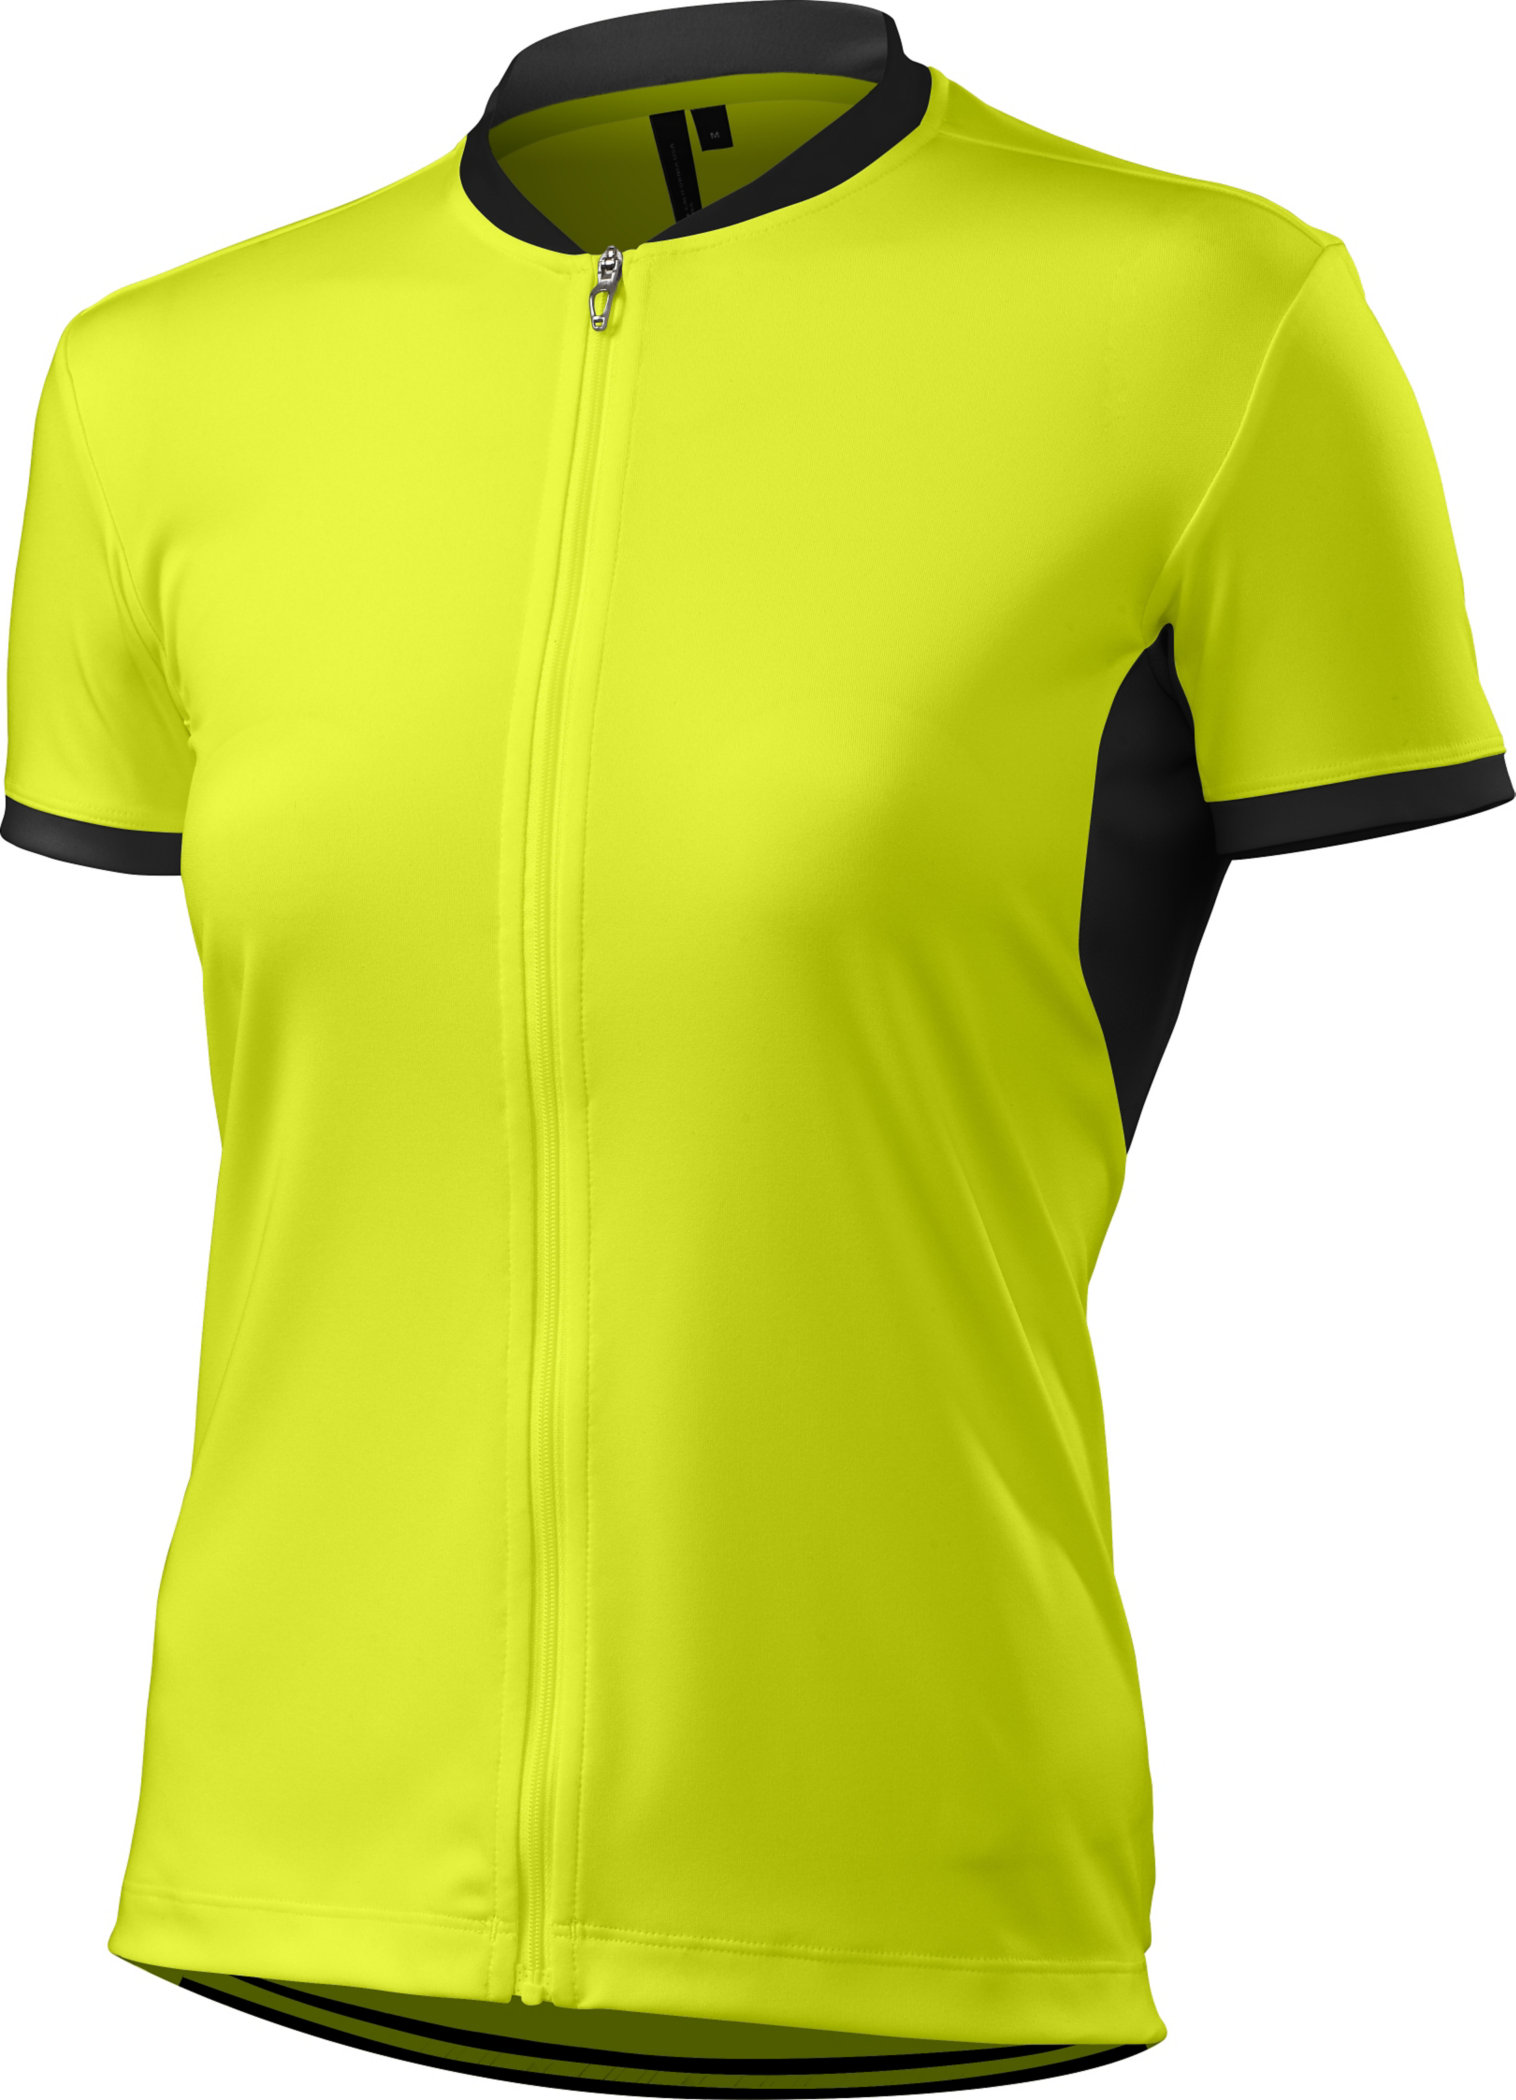 Specialized Women´s RBX Sport Jersey Neon Yellow/Black Large - Alpha Bikes